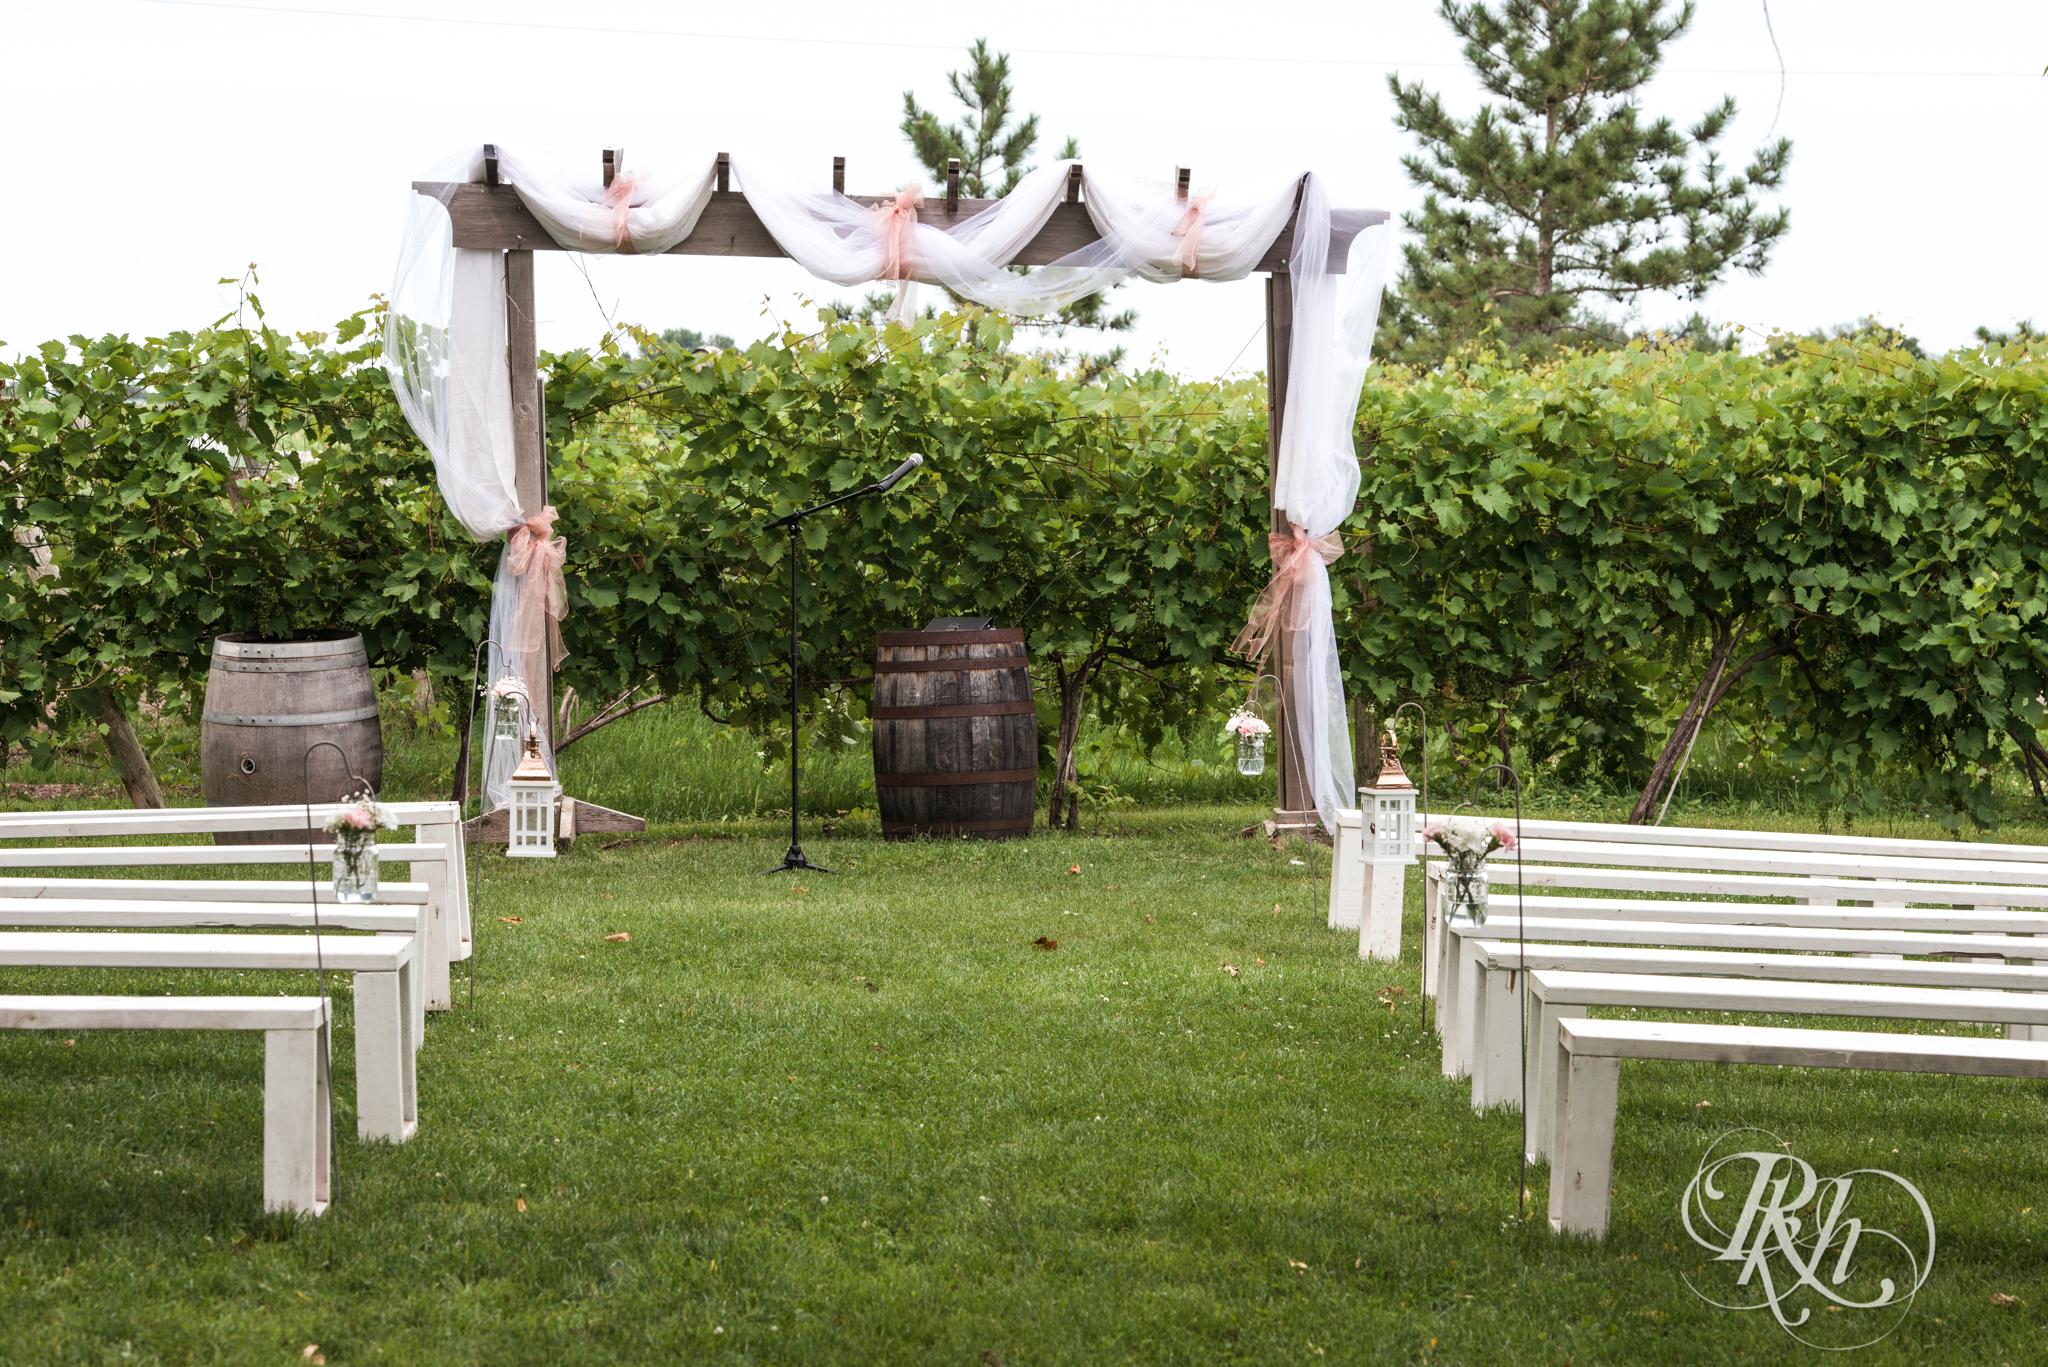 Ally & Nick - Minnesota Wedding Photography - Next Chapter Winery - RKH Images - Blog (3 of 57).jpg